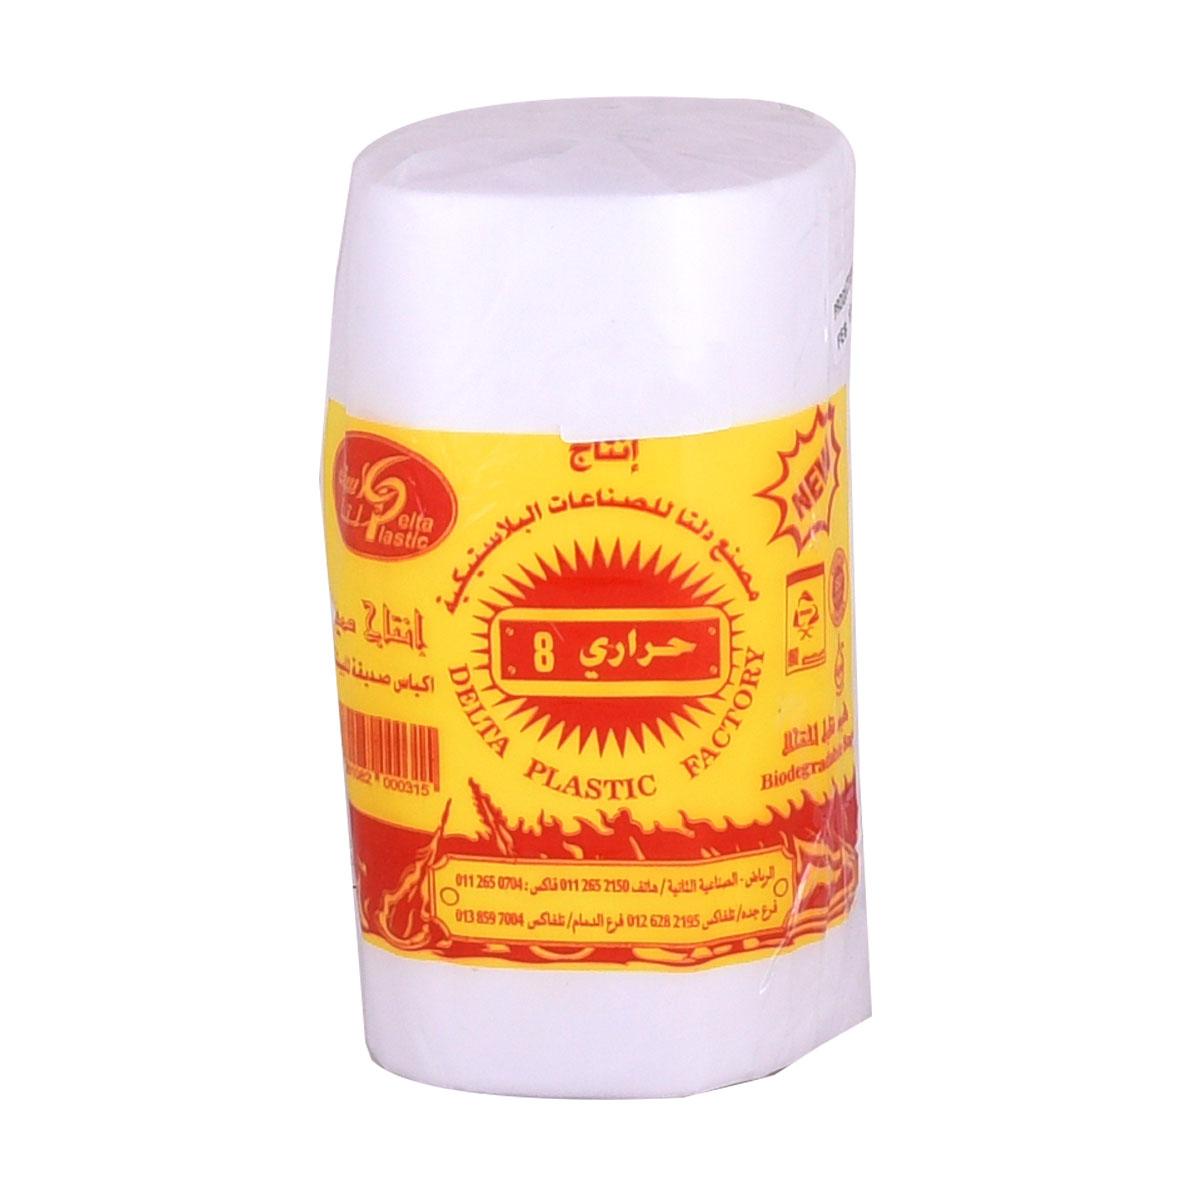 كيس طعام بلاستيك حراري رقم 8 رول من دلتا.